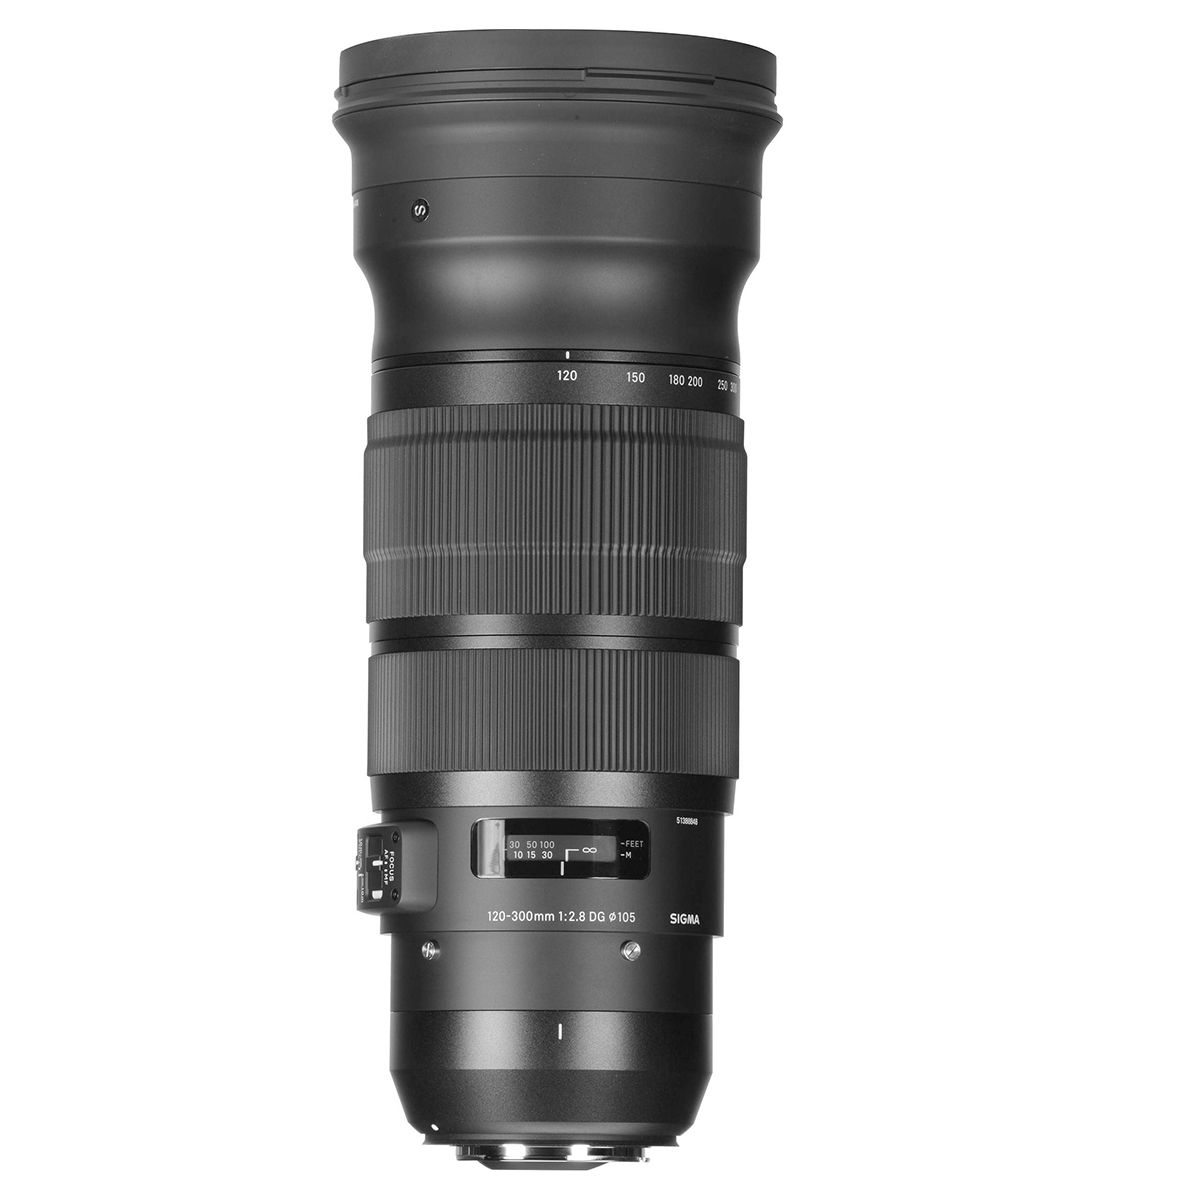 Sigma 120-300/2.8 Dg Os Hsm -(S)